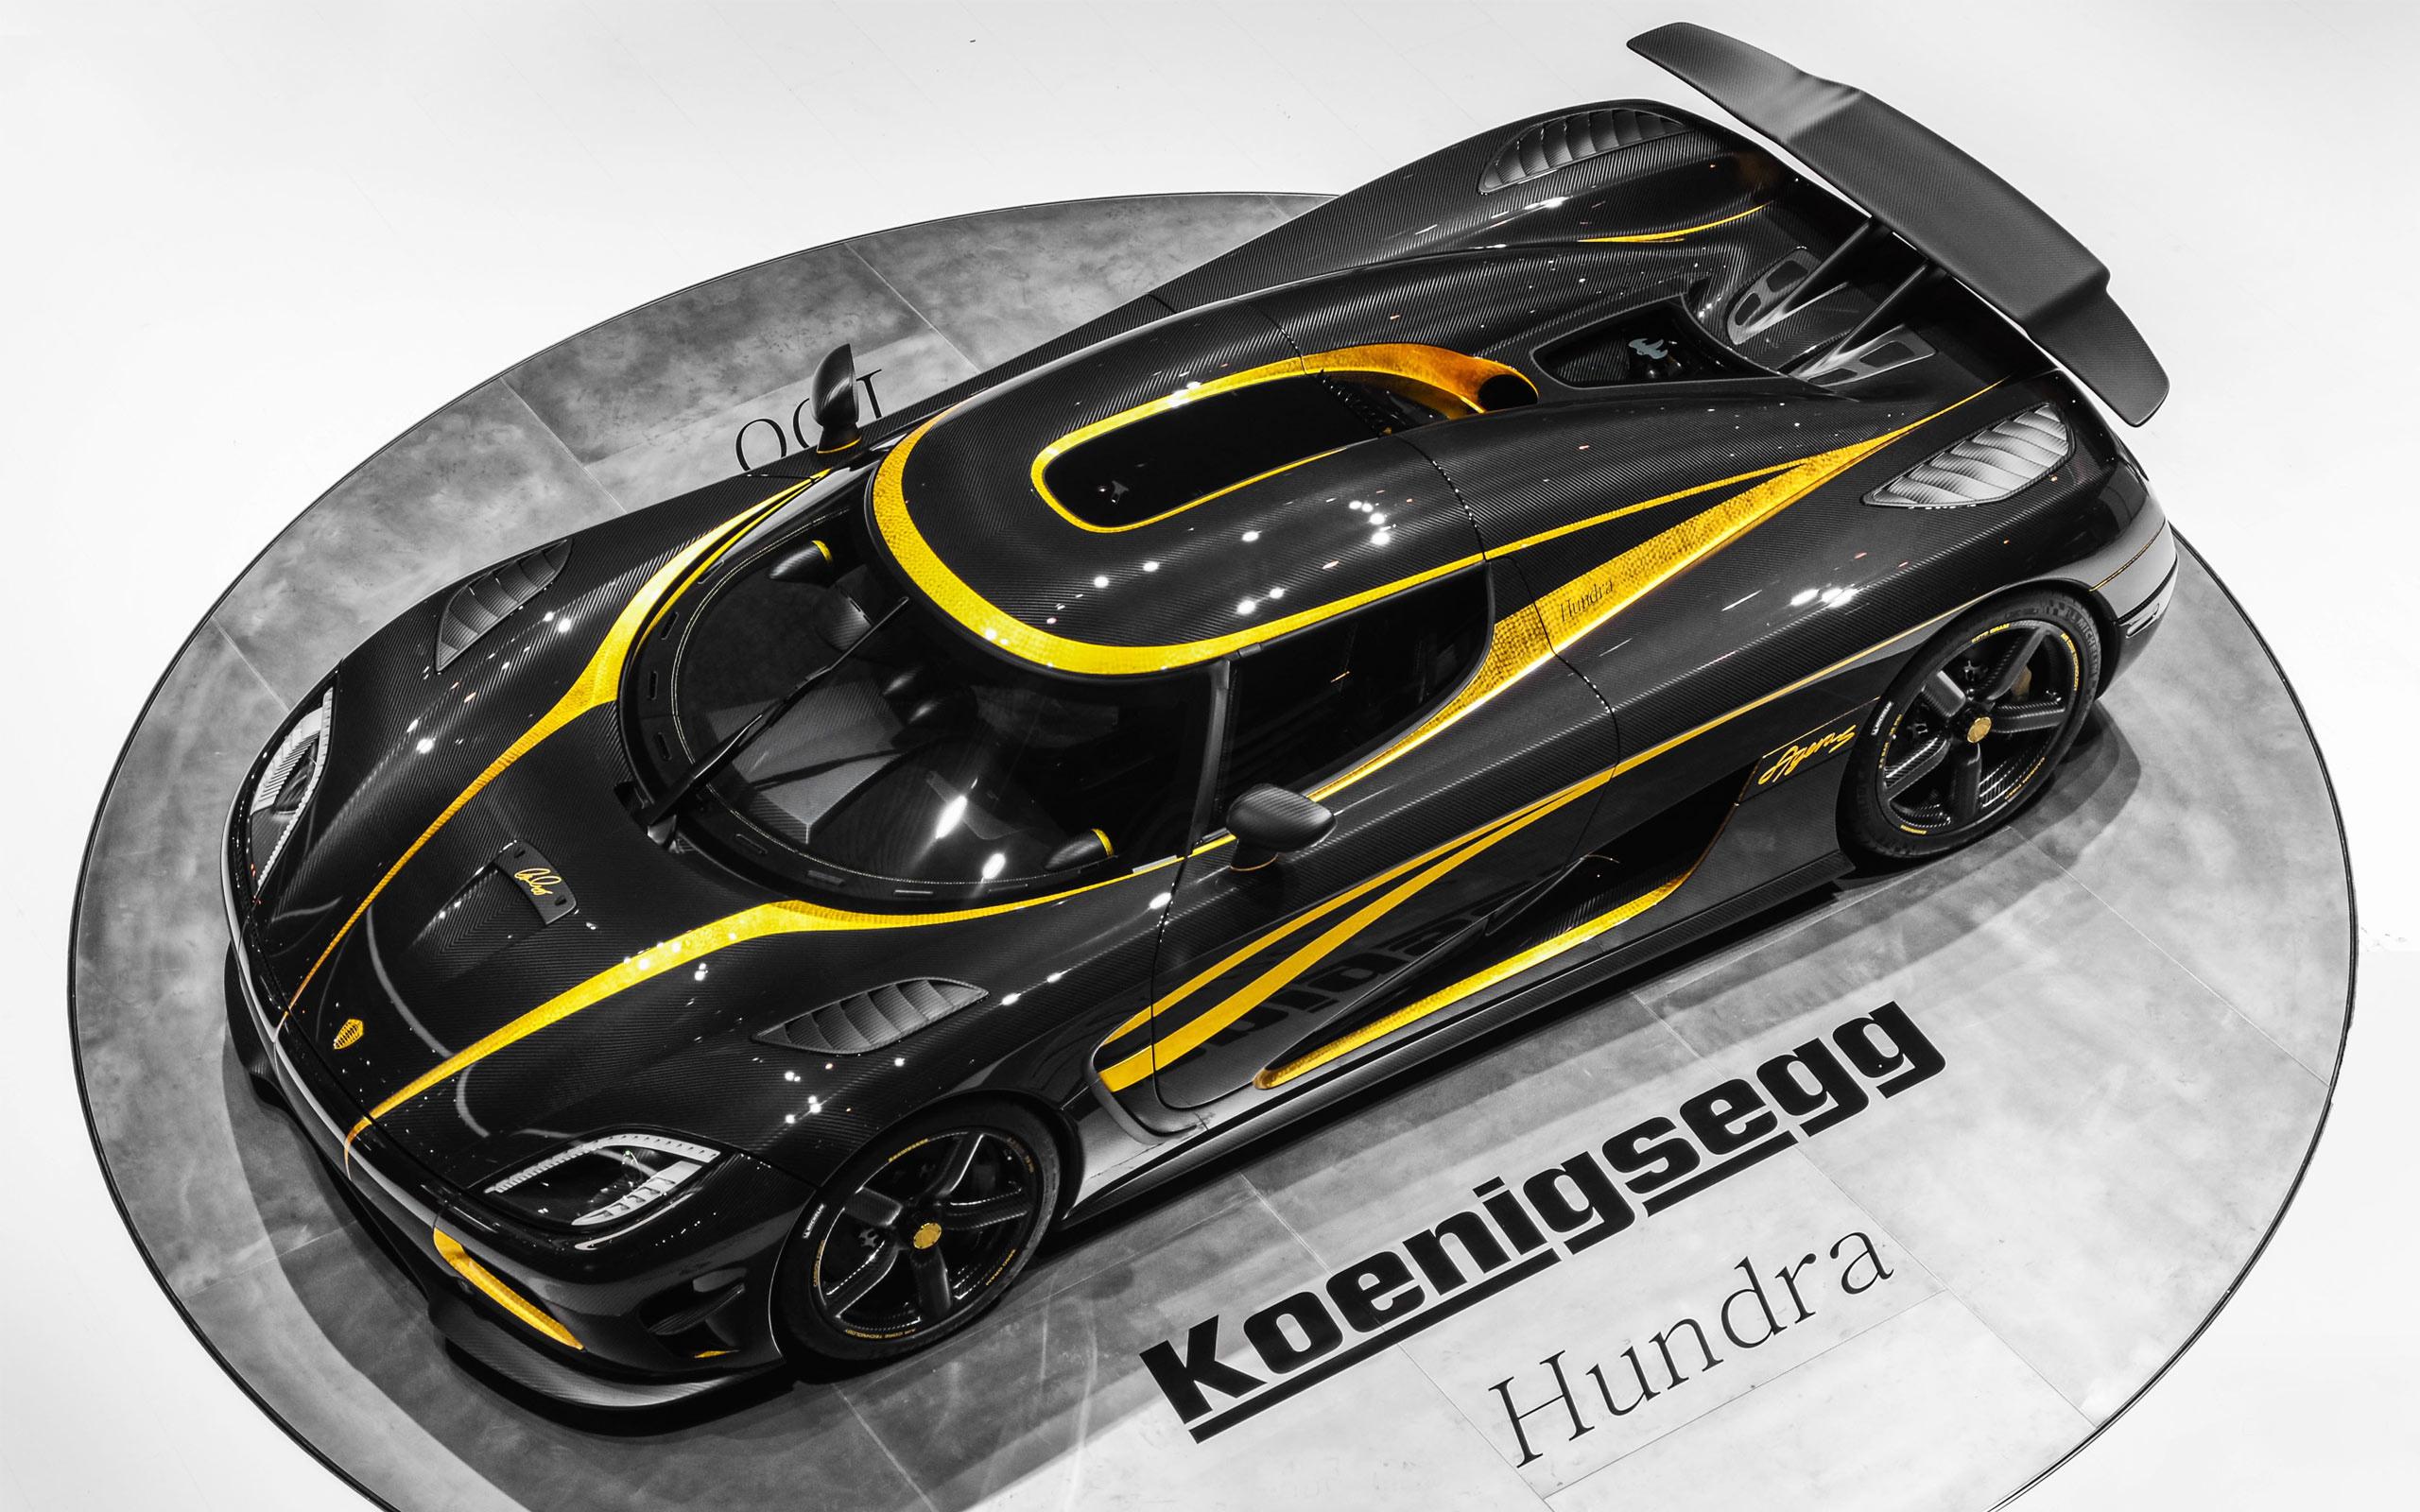 L'Agera Hundra, la 100ème Koenigsegg produite !